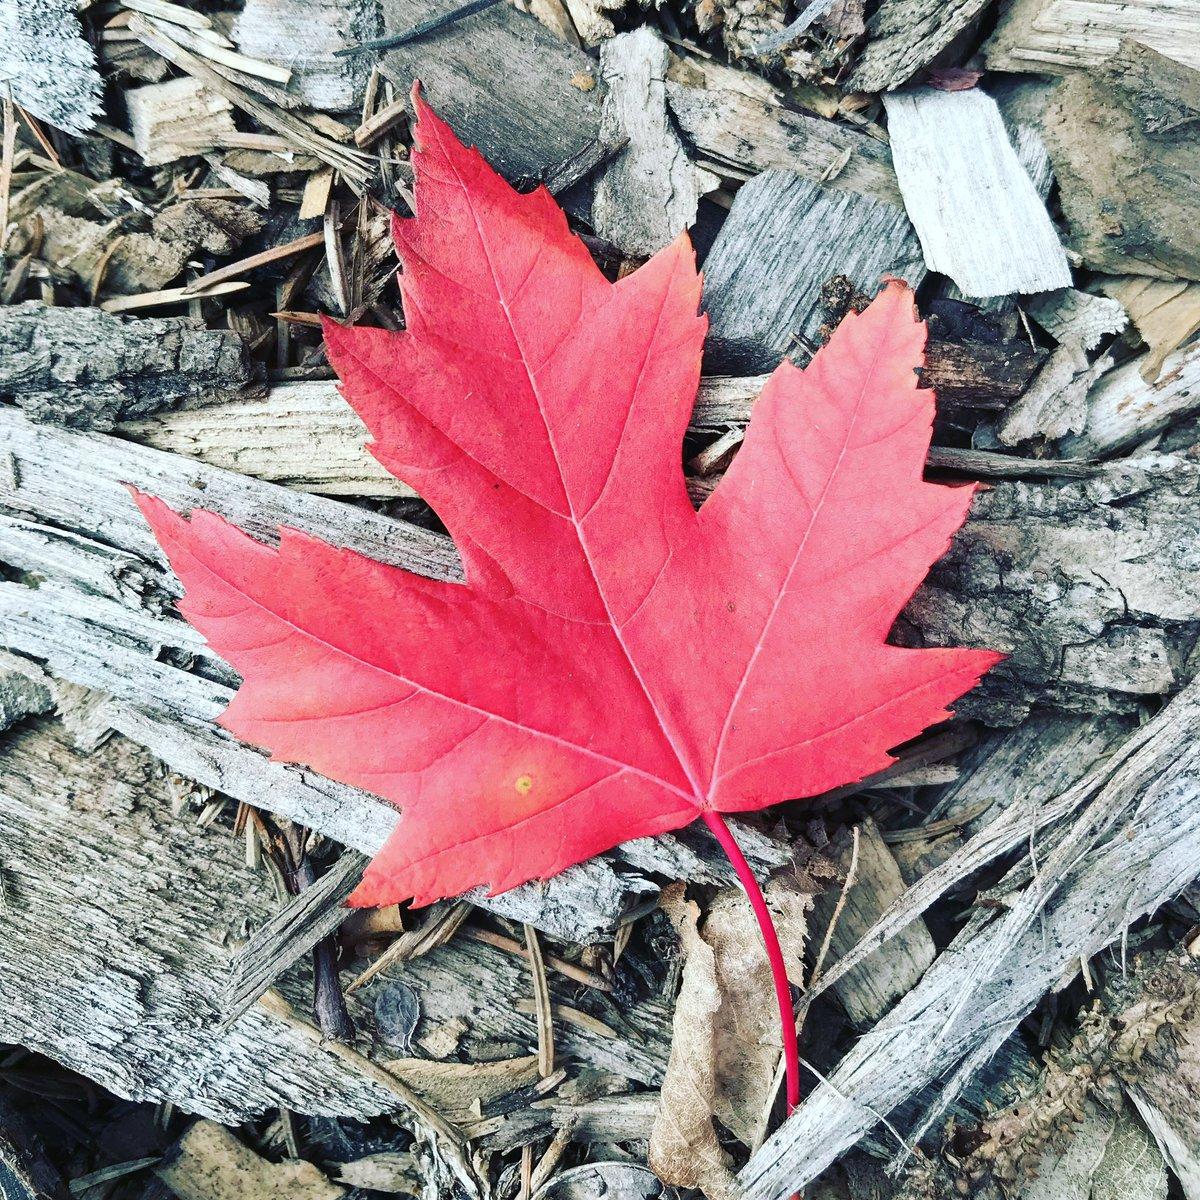 Happy Canada Day! 🇨🇦❤️ #UAlberta https://t.co/yQBnj3UP5o